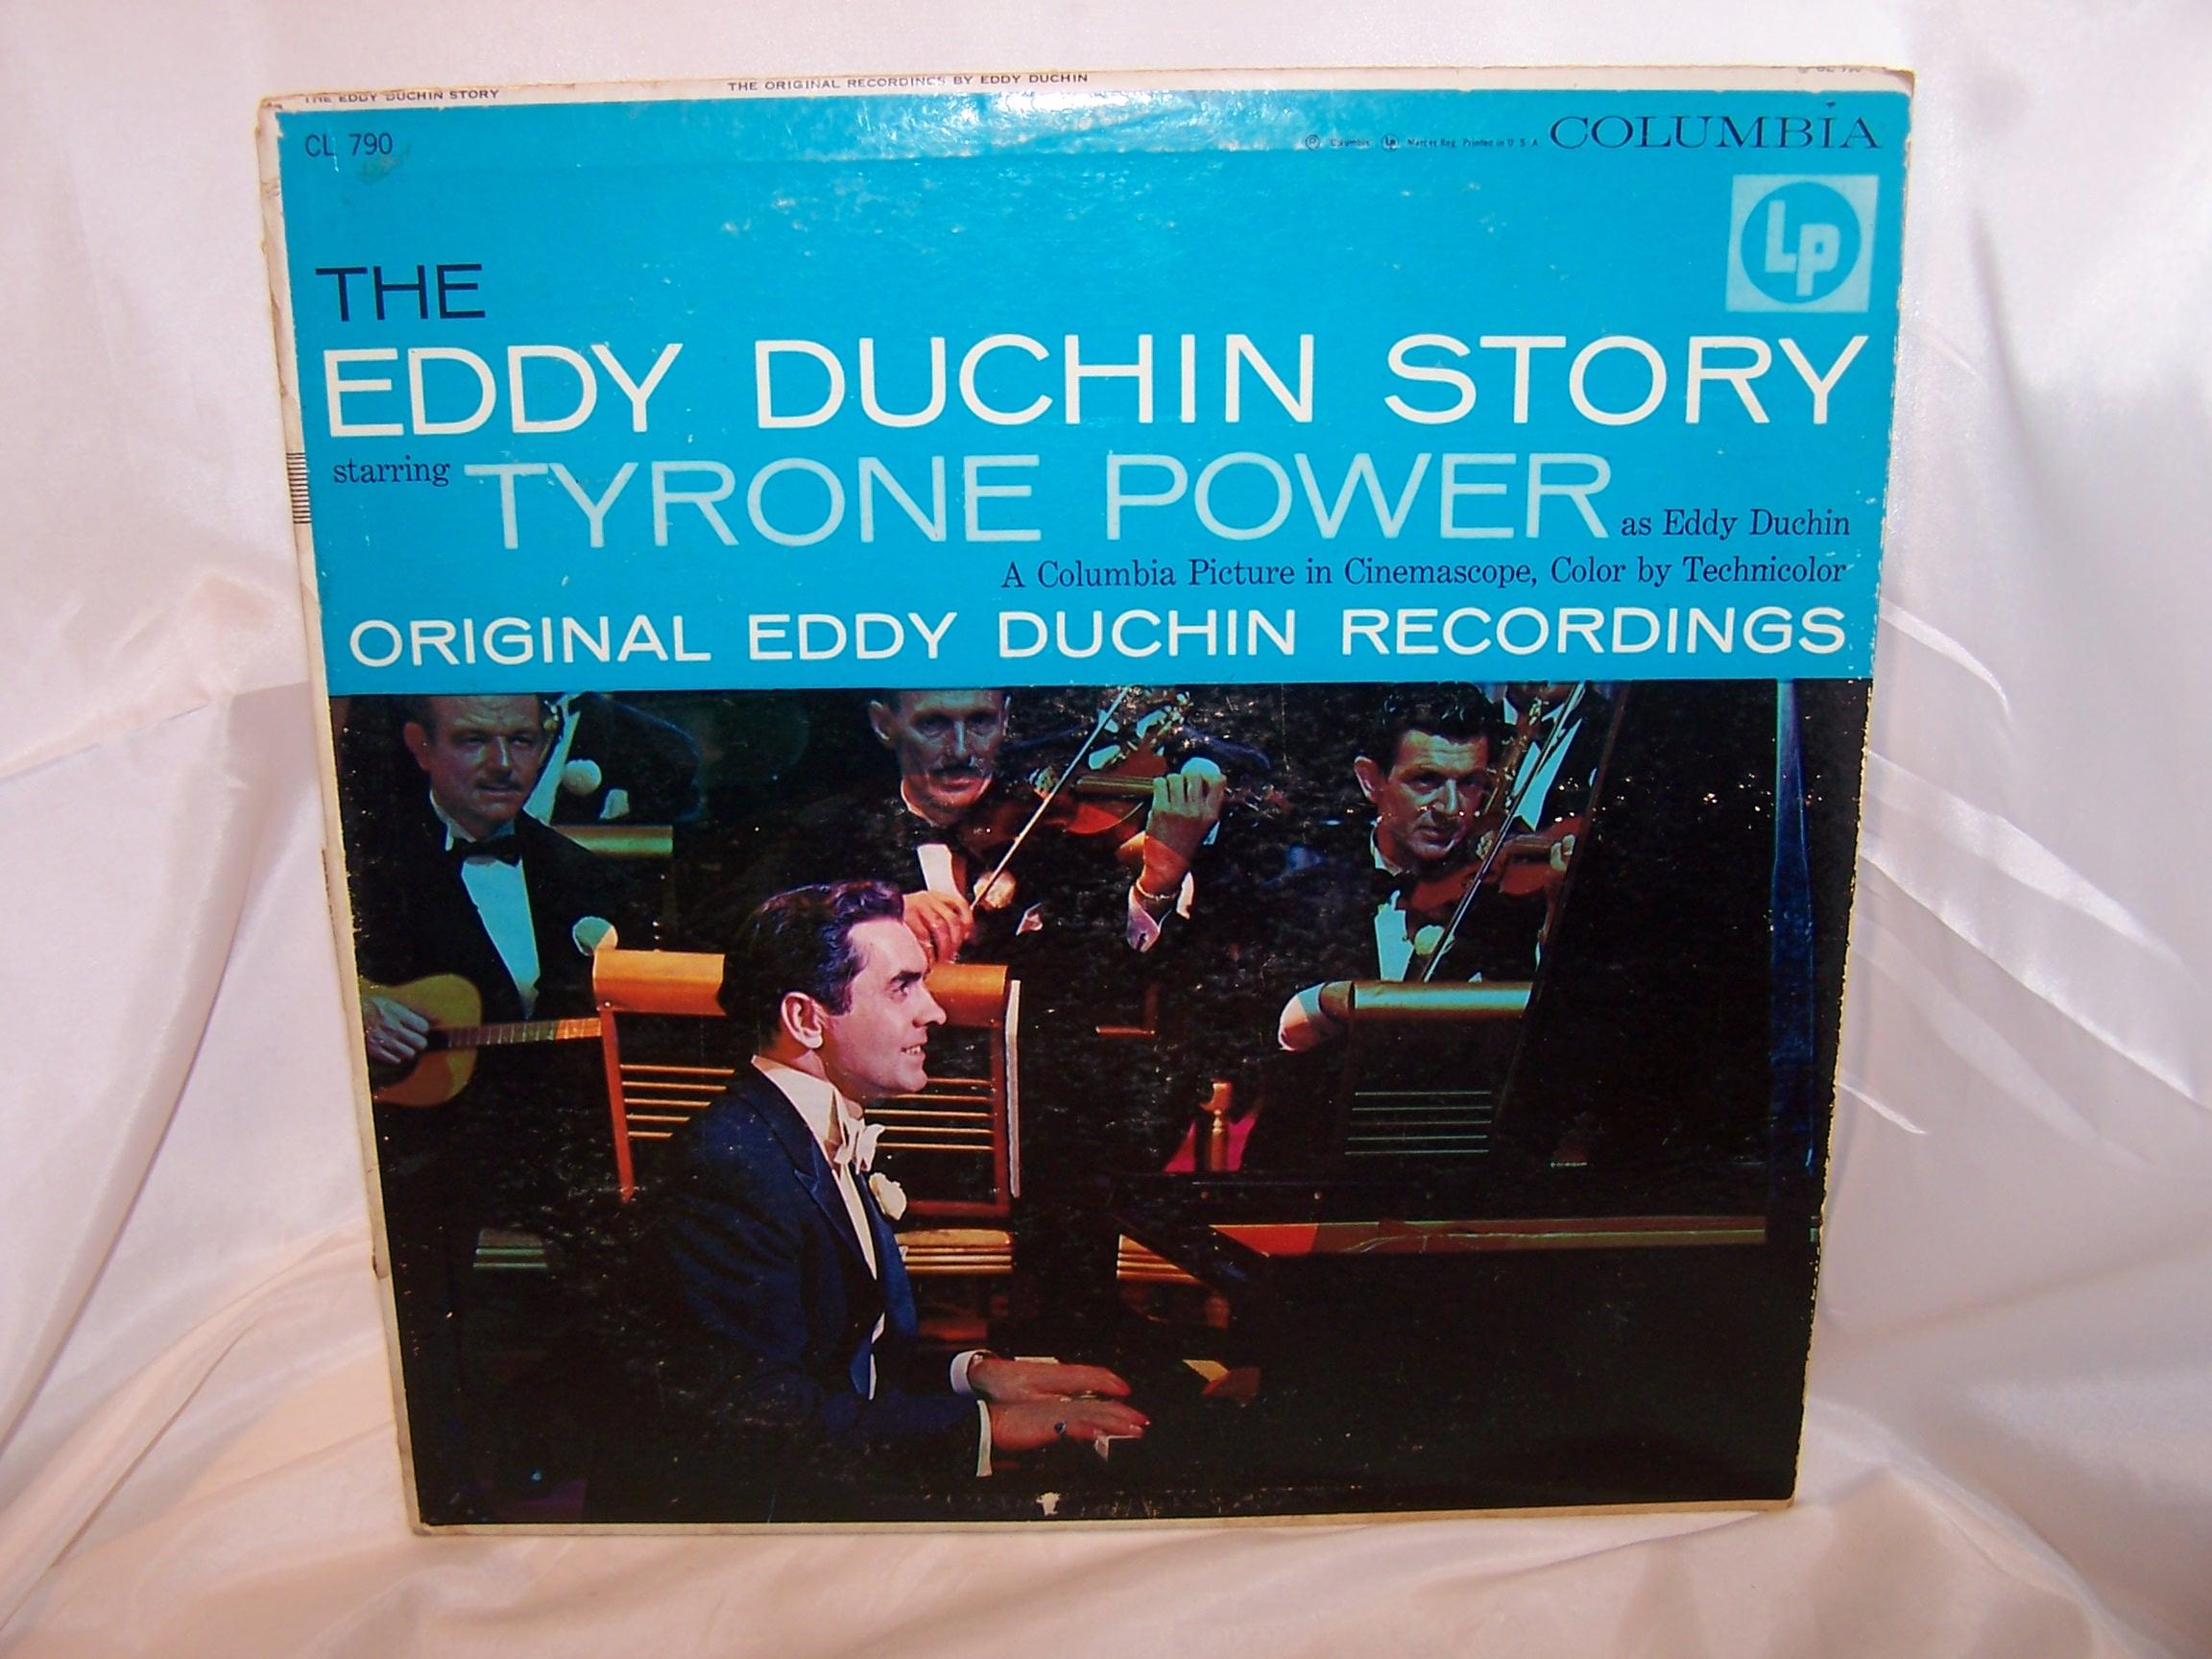 Eddy Duchin Story Record Album, Columbia, Tyrone Power